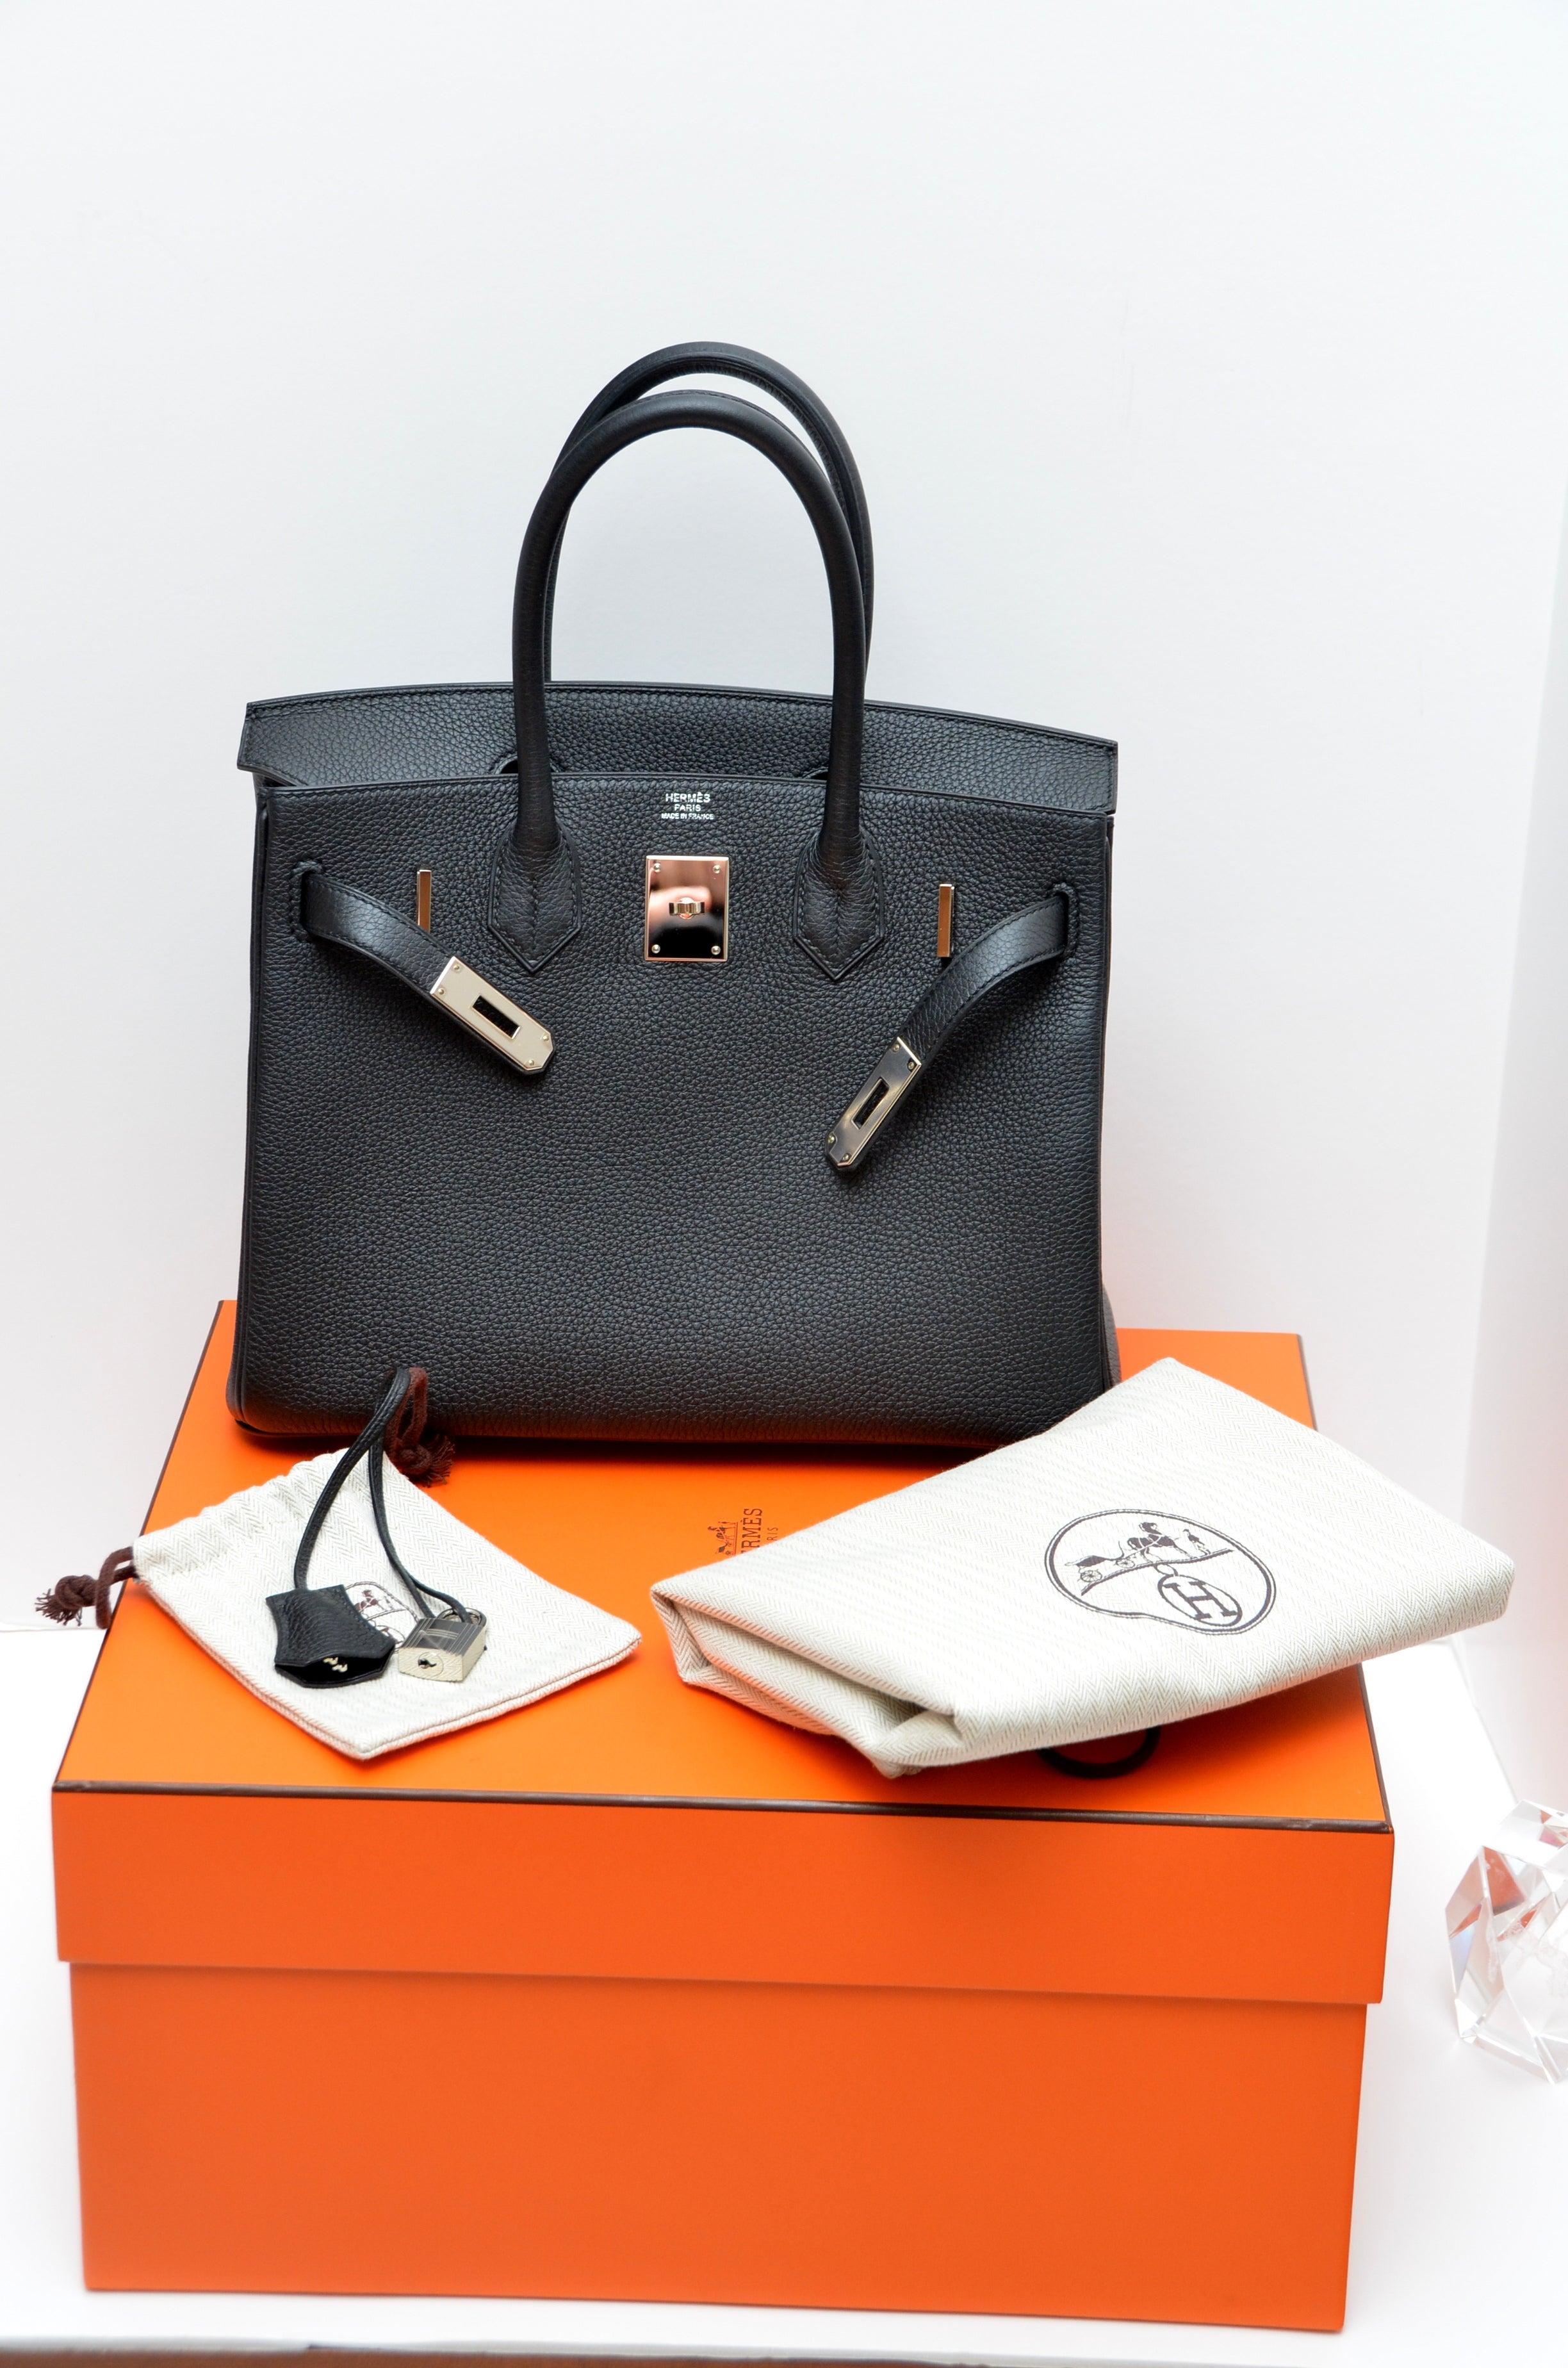 9e1a171f2eba Hermes Birkin 30cm Black Togo Palladium Hardware Handbag Mint For Sale at  1stdibs